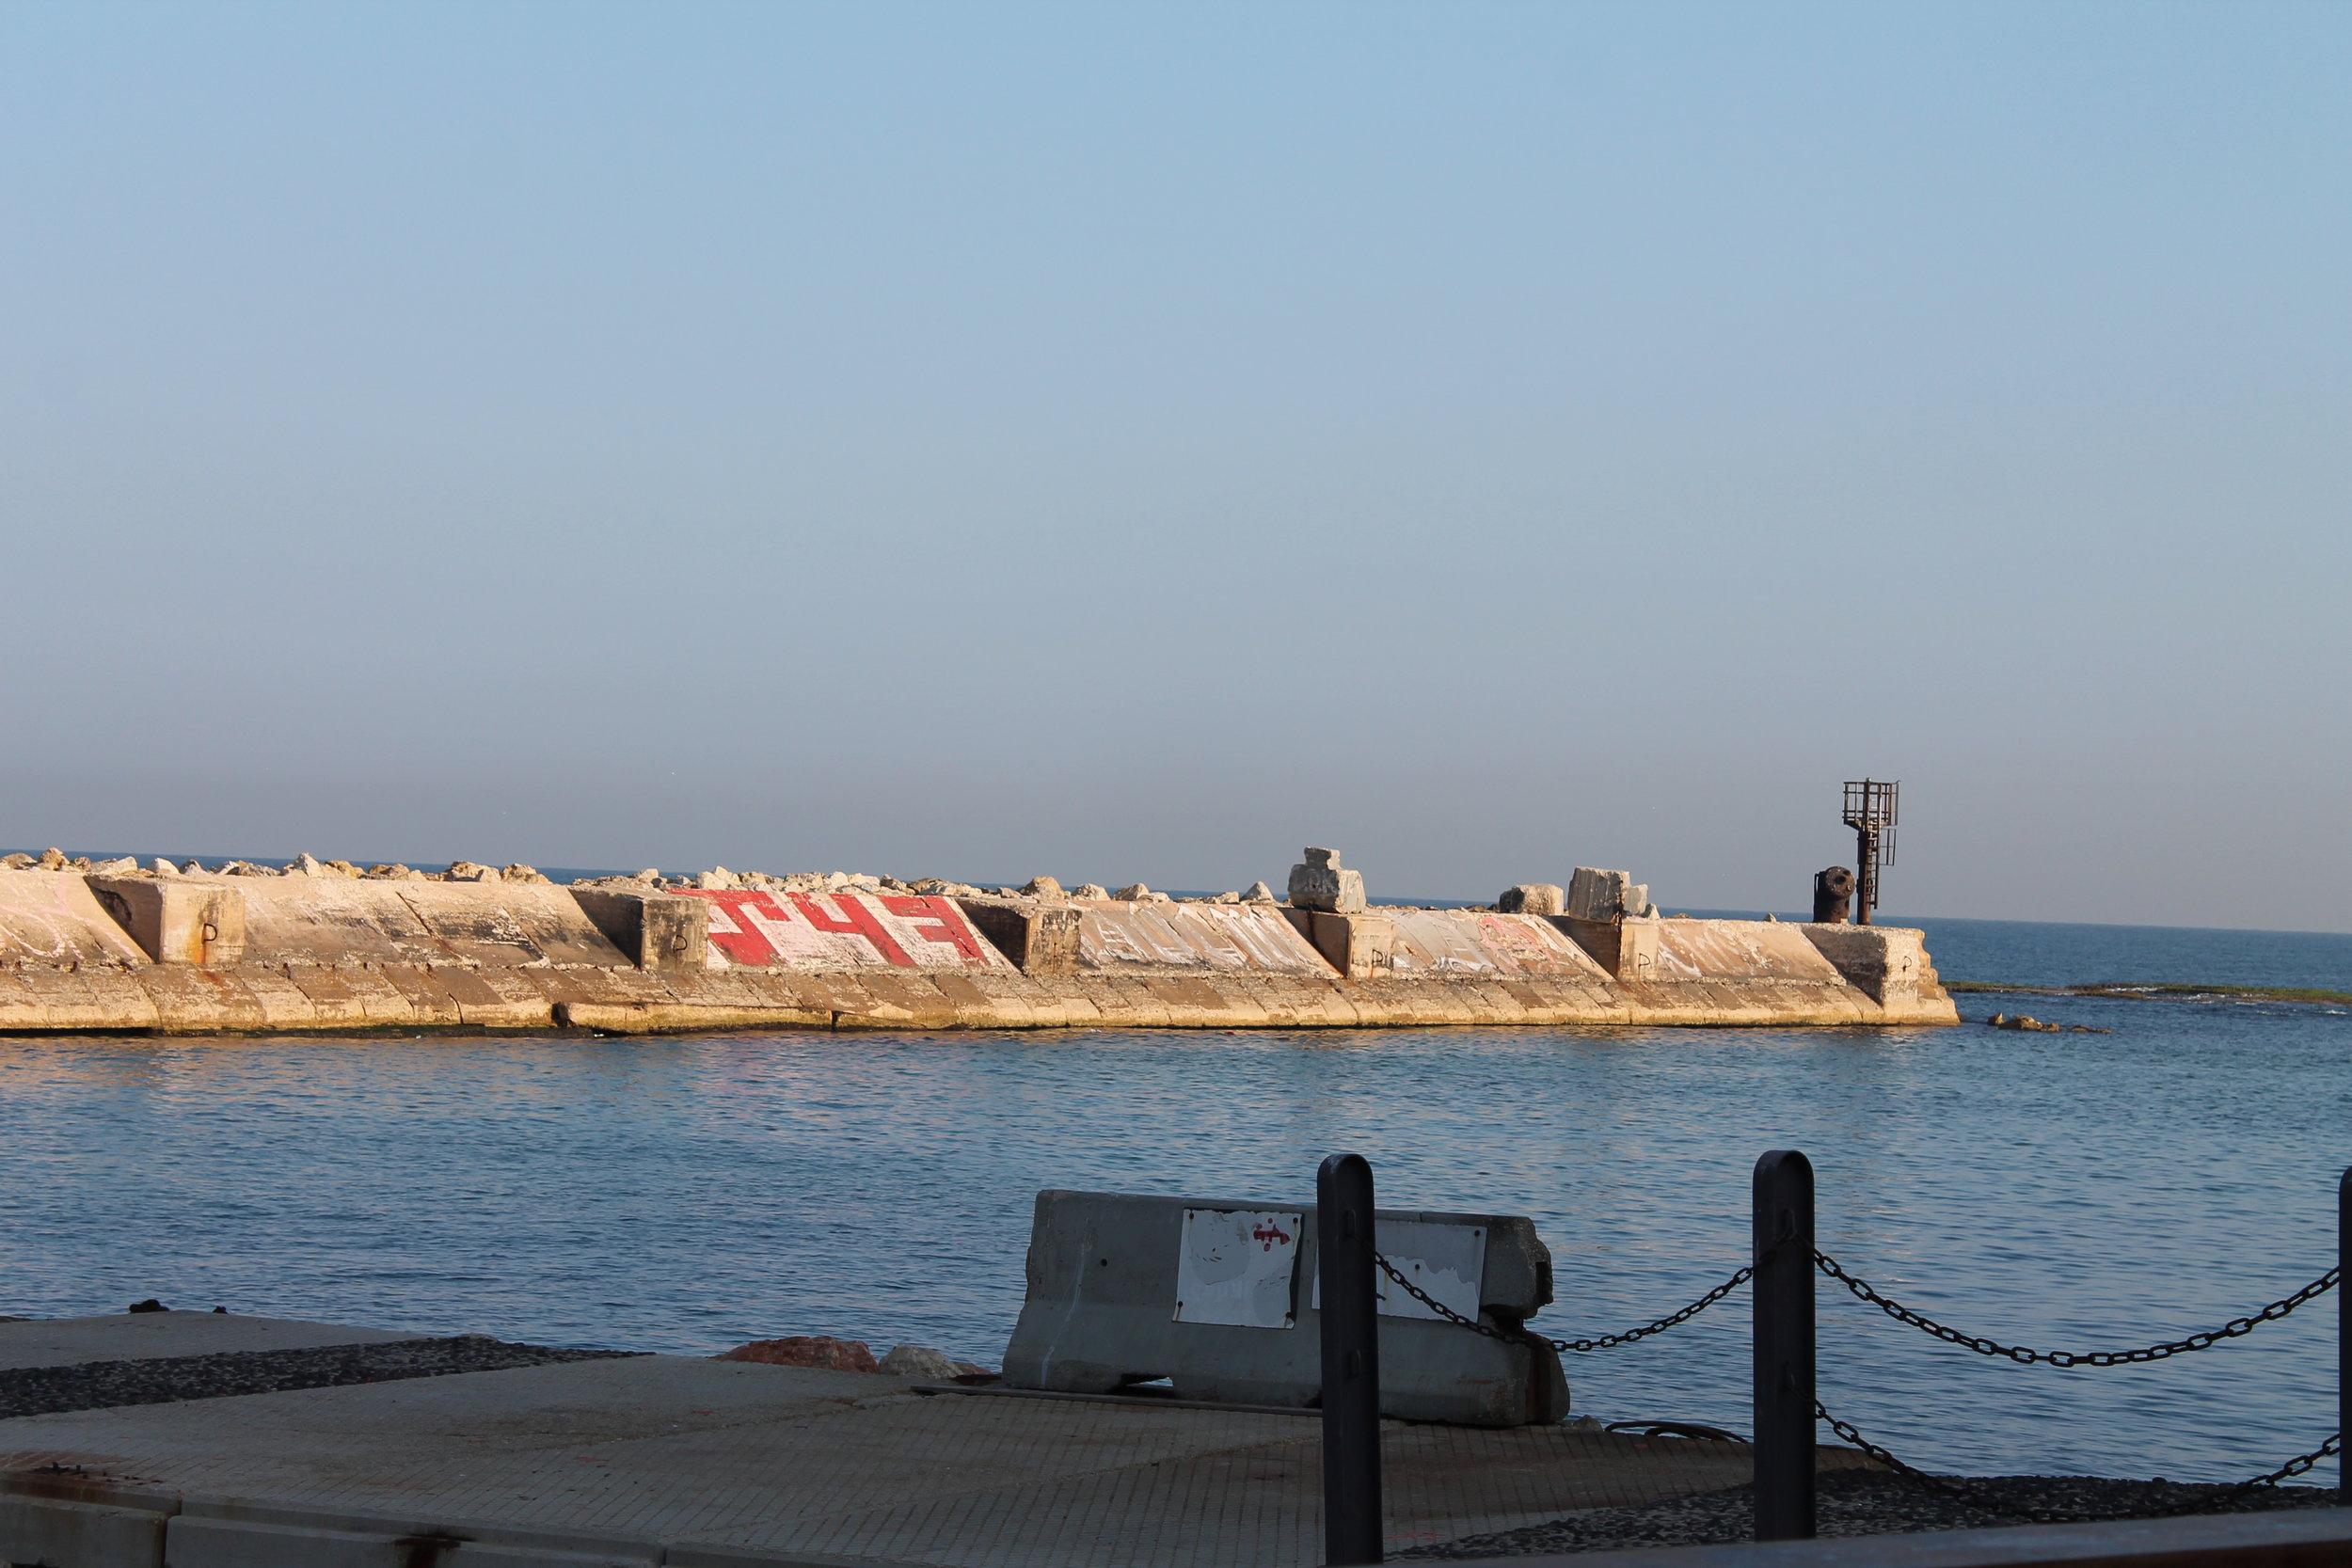 The harbor of ancient Joppa.